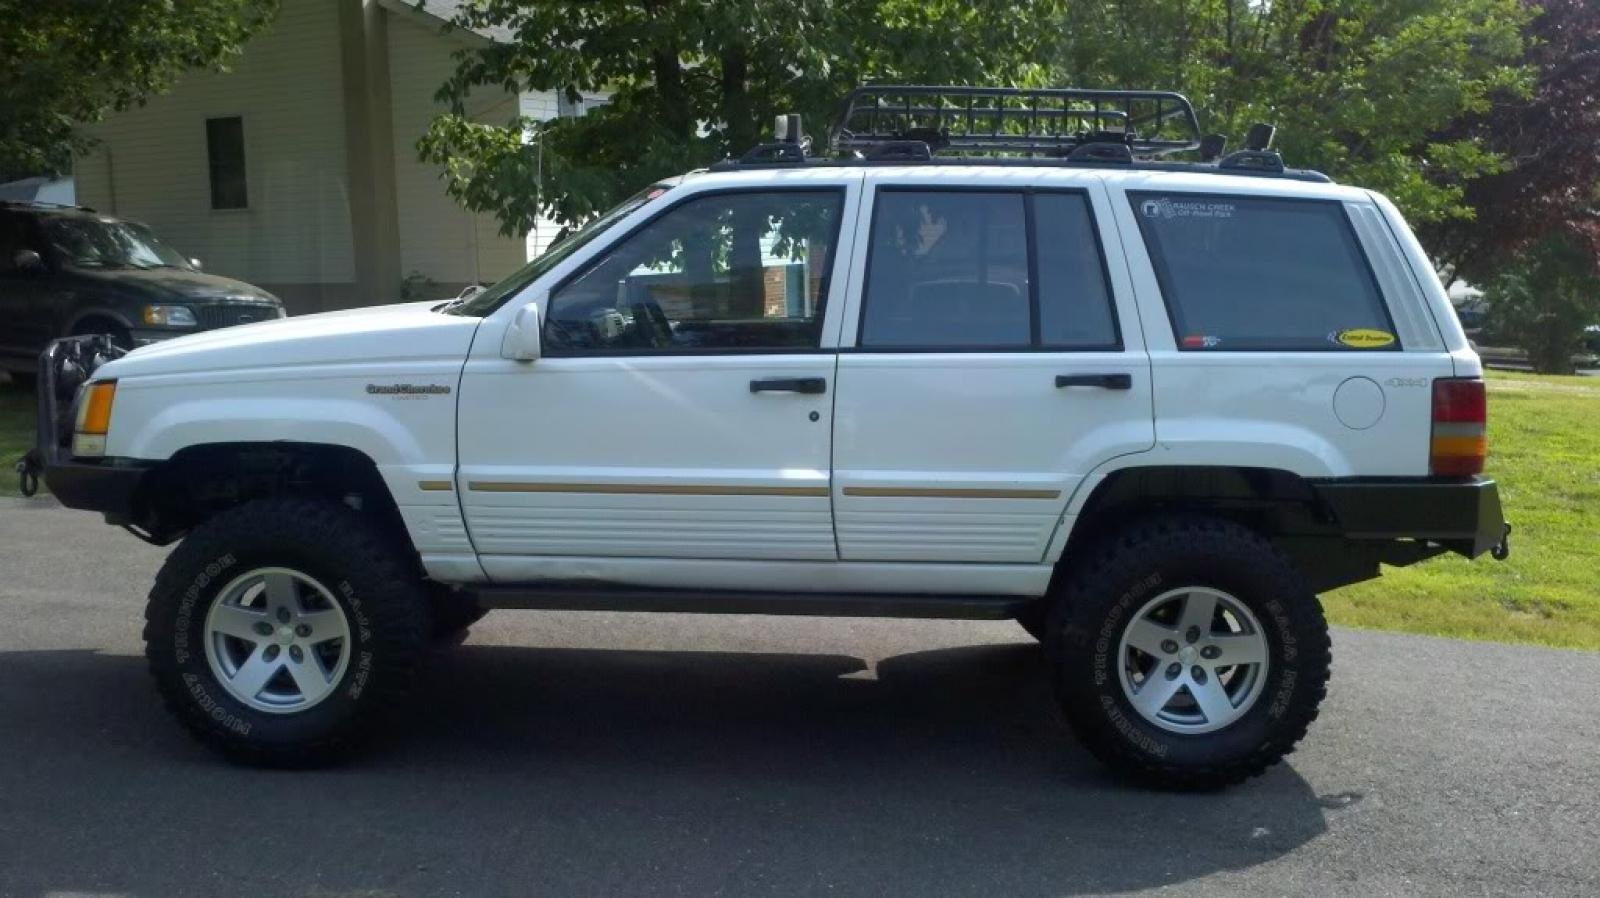 High Quality 1994 Jeep Grand Cherokee #1 800 1024 1280 1600 Origin